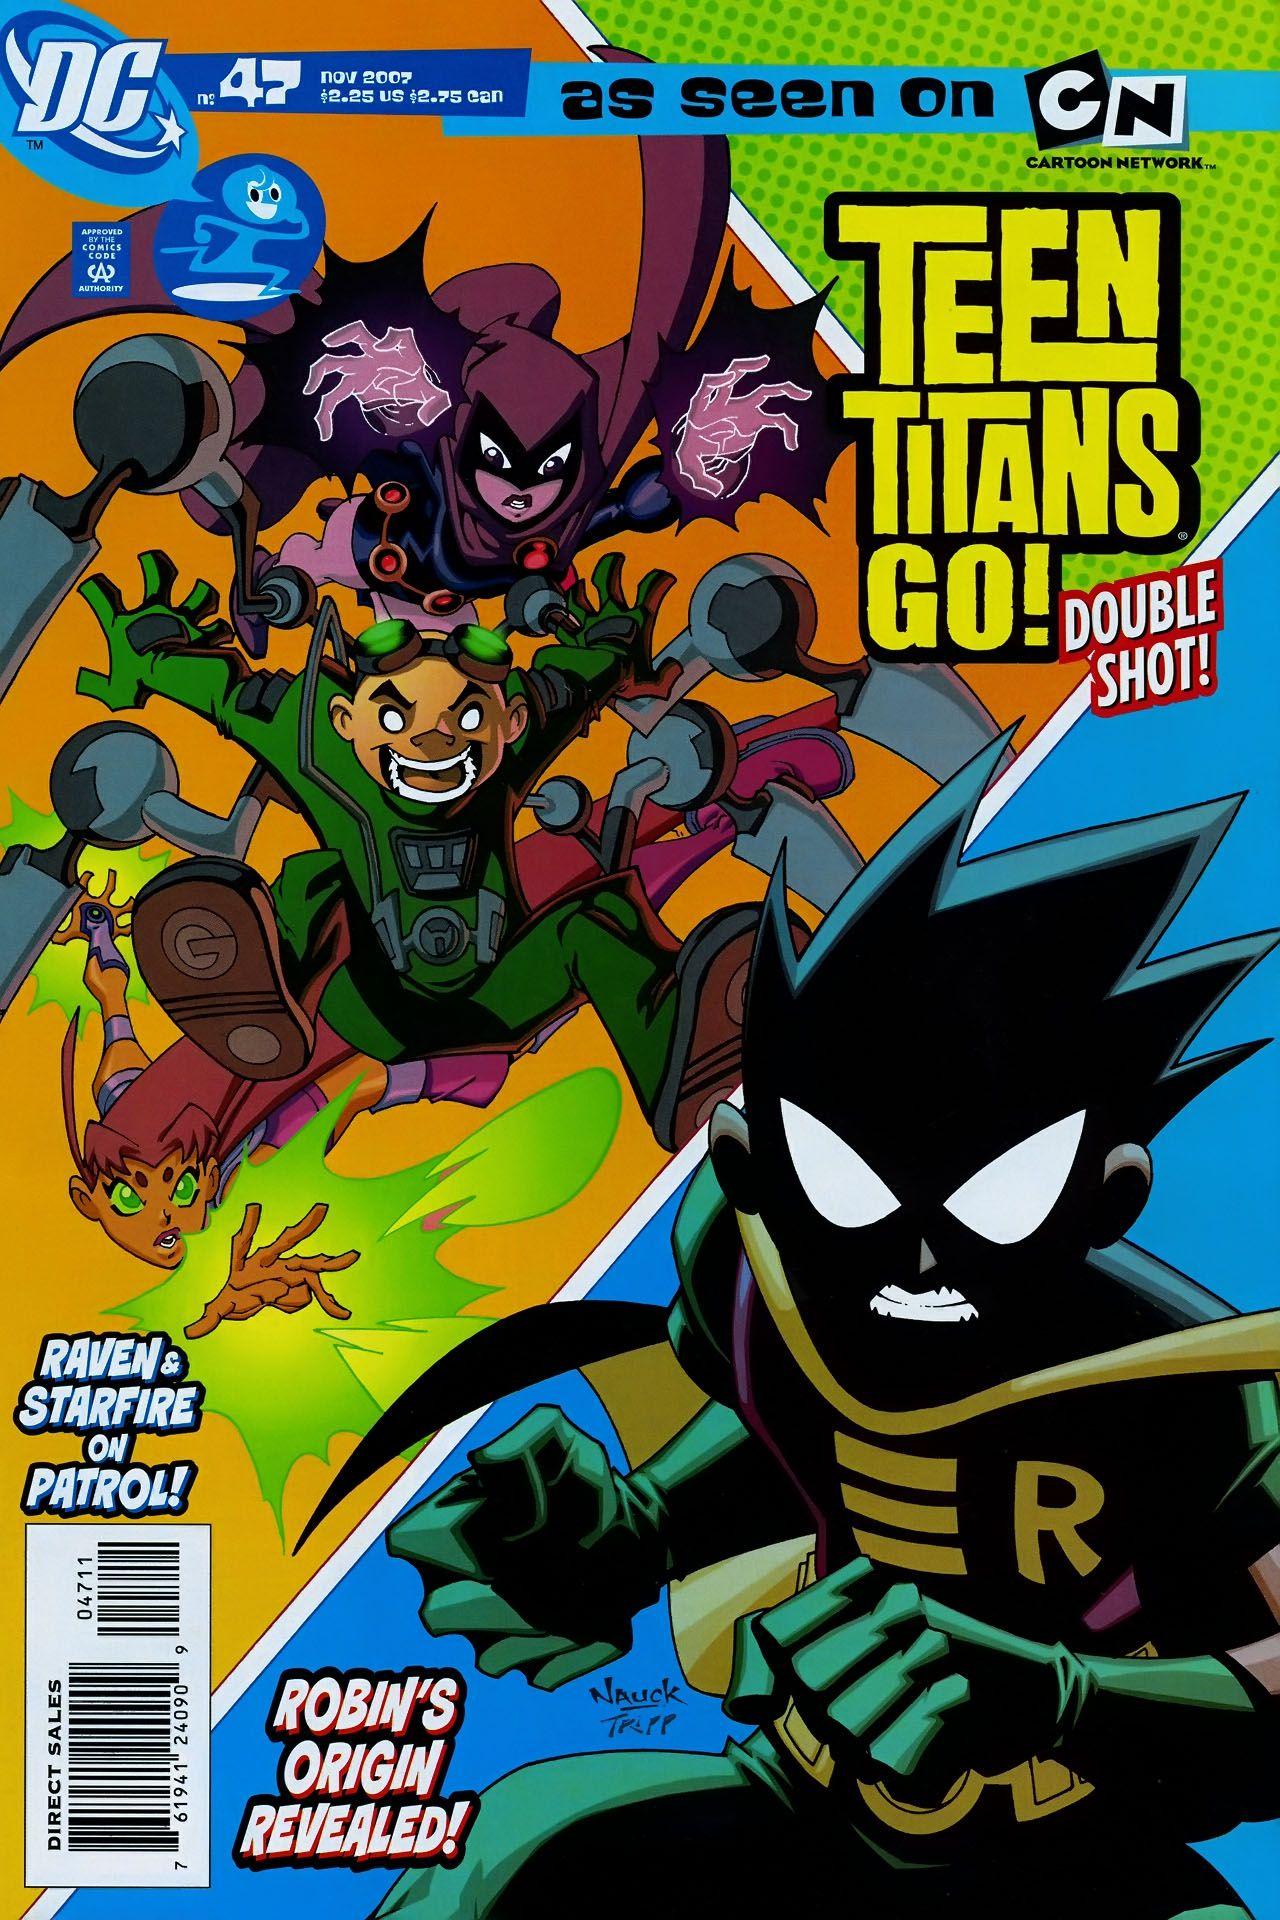 teen-titans-go-comic-online-free-black-sex-videdos